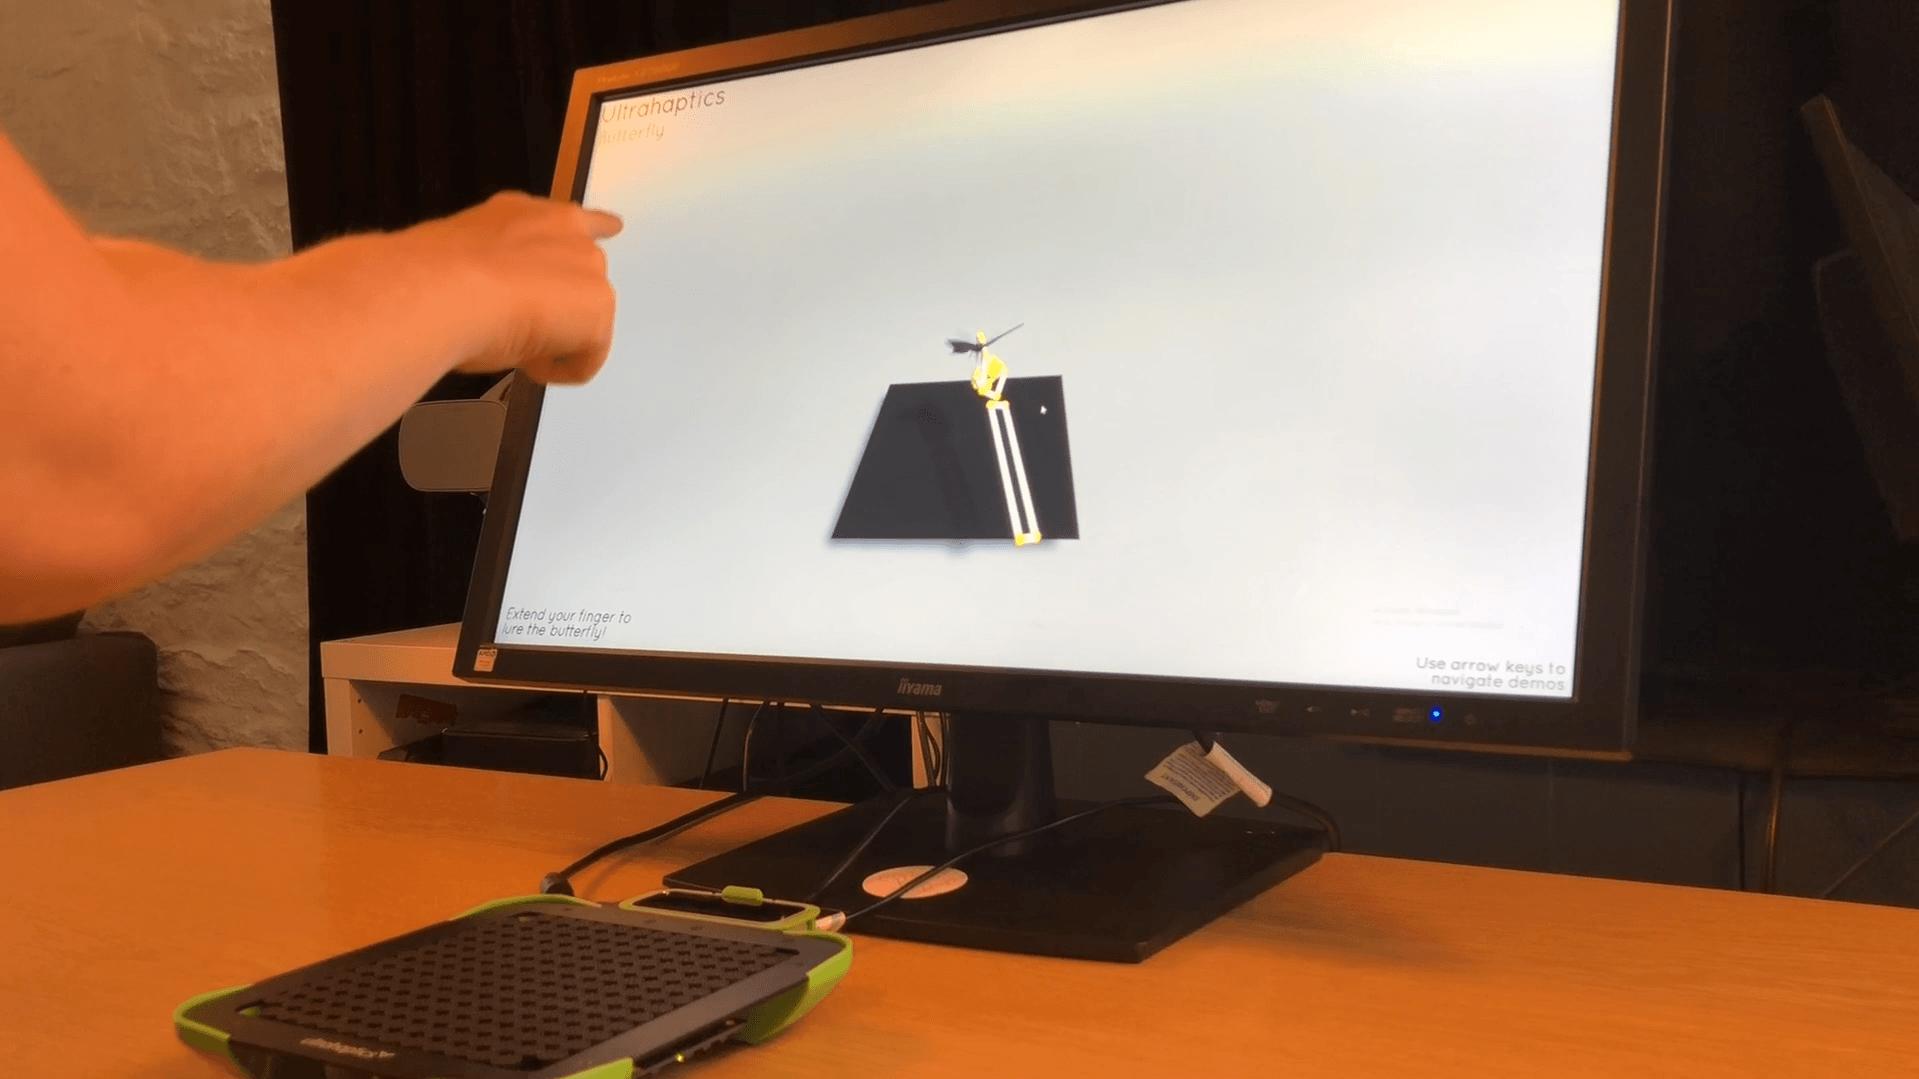 Can touch this! Ultrahaptics development blog